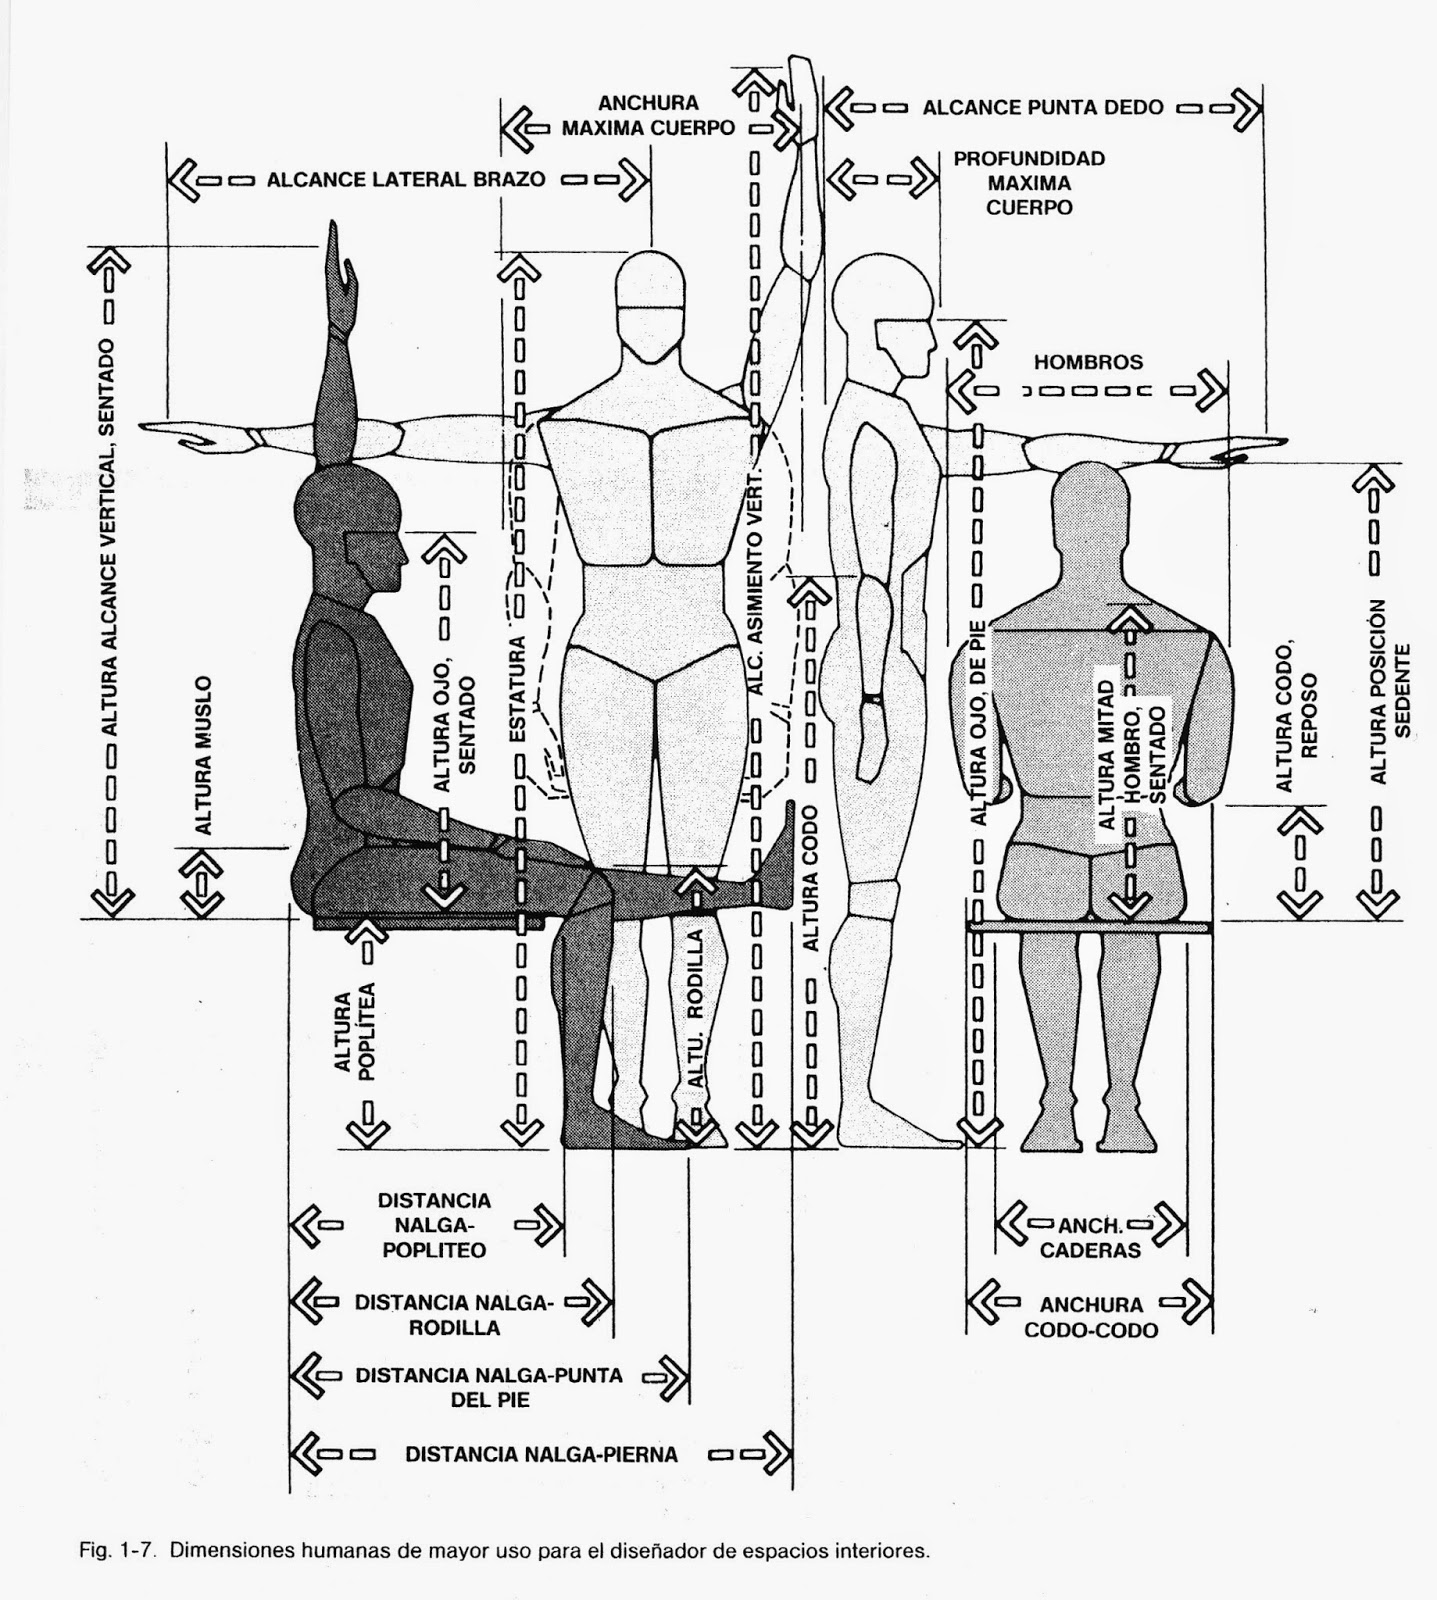 Ergonomia eucd nombres de las dimensiones humanas for Antropometria libro